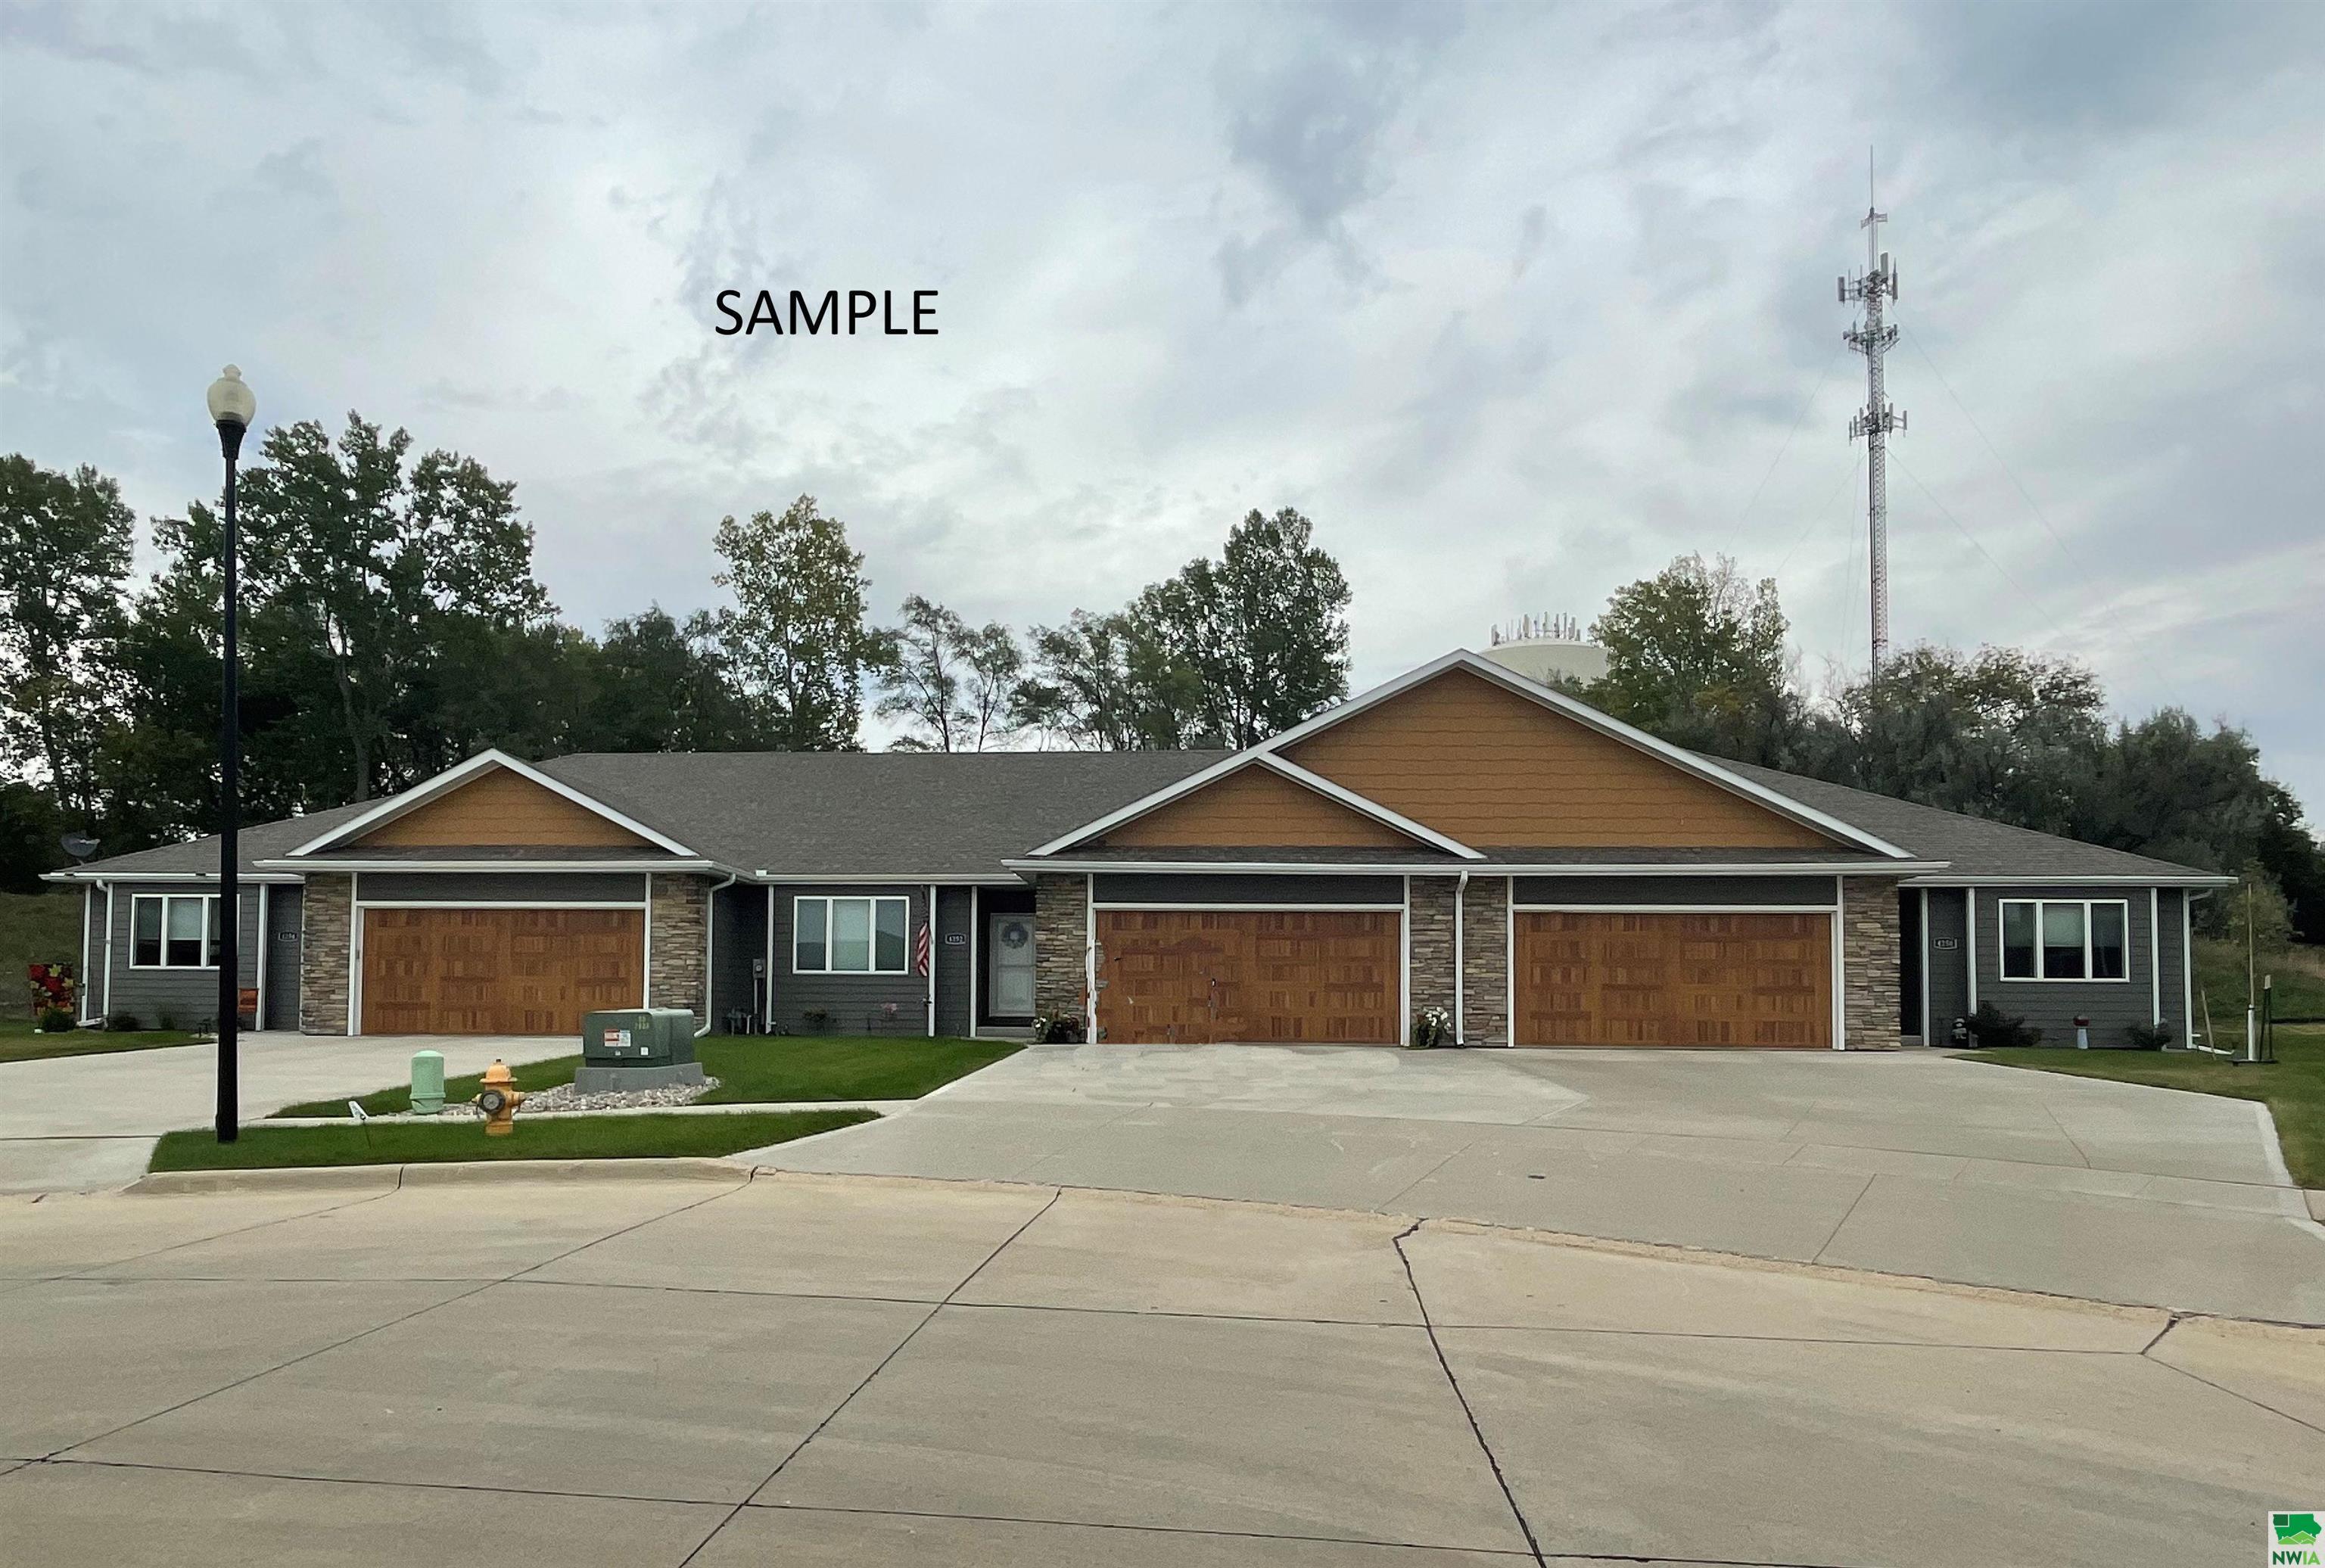 4235 Fremar Drive, Sioux City, Iowa 51104